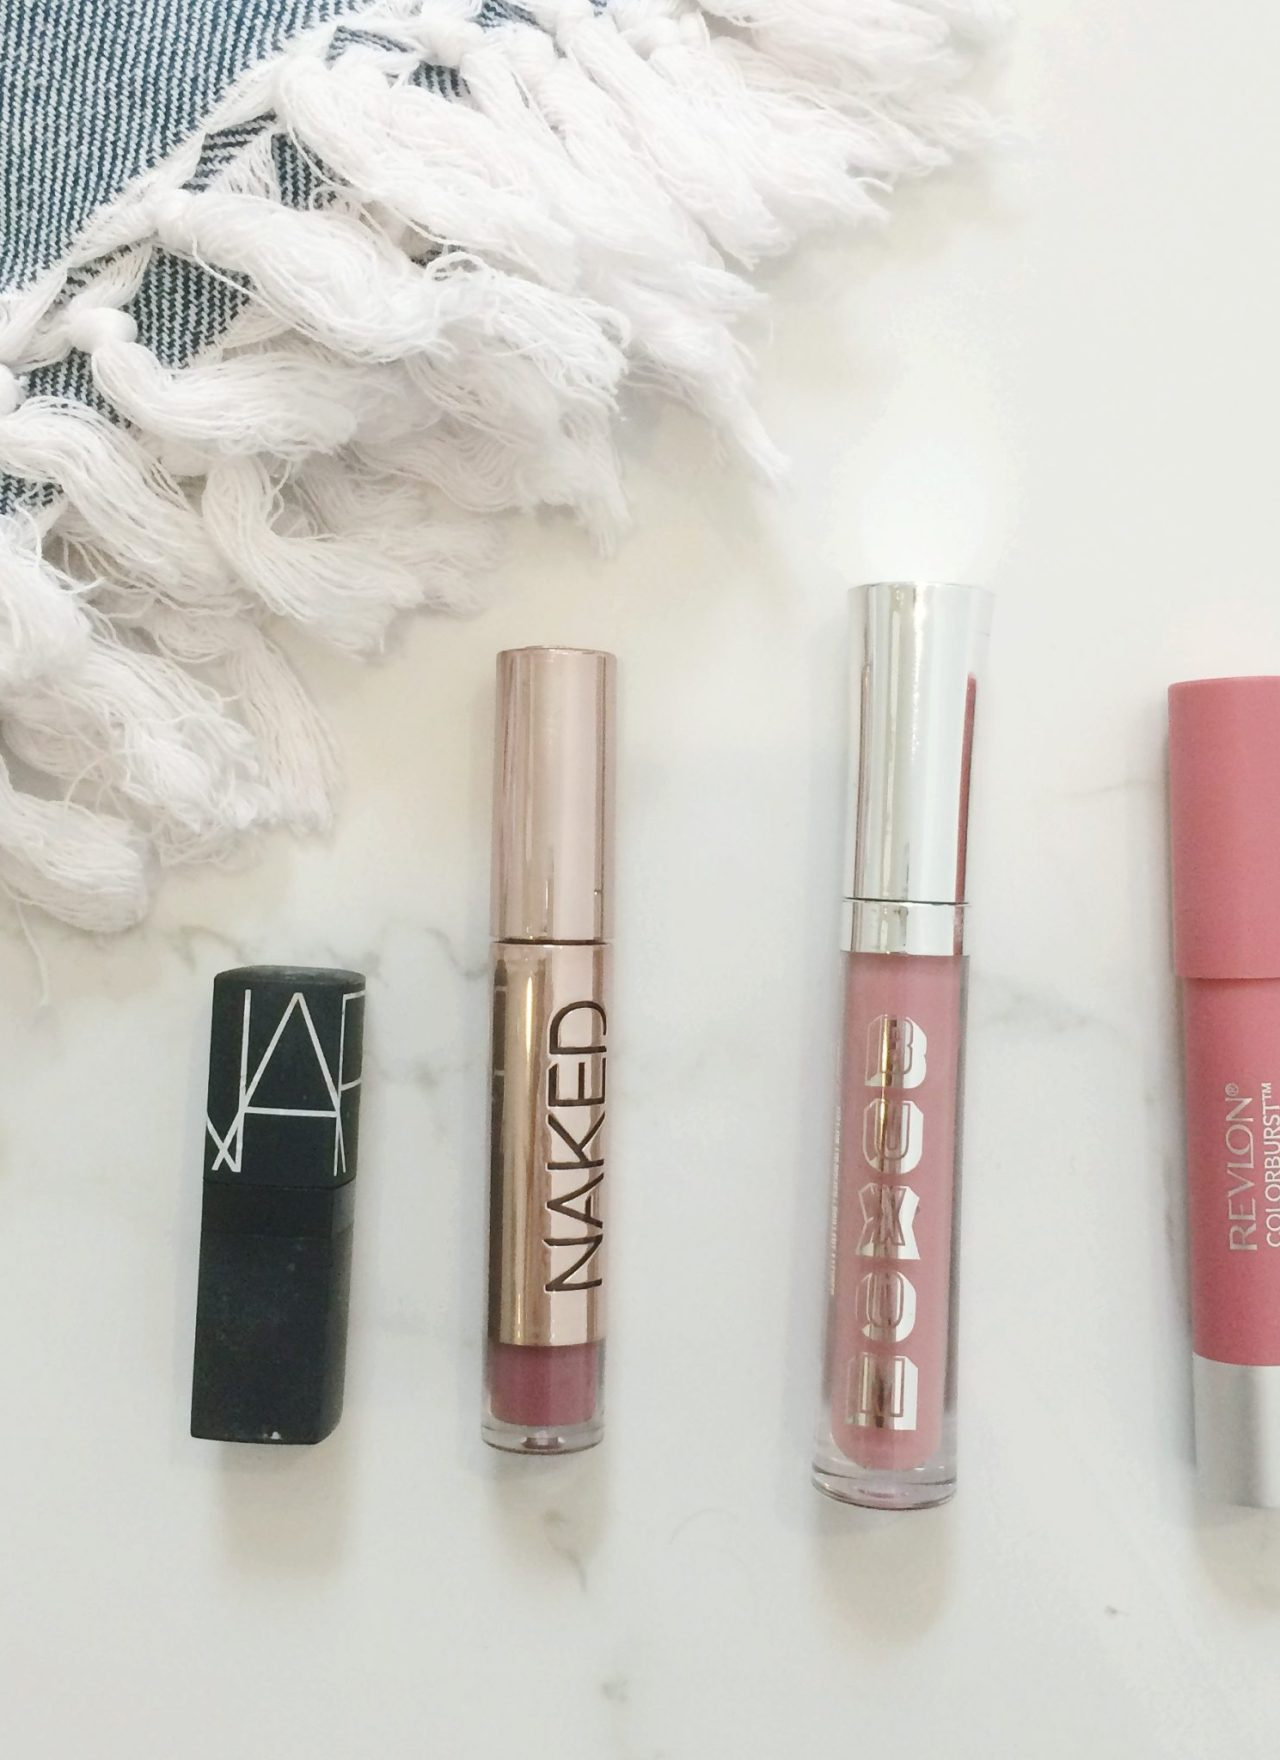 Current Favorite Lipcolors